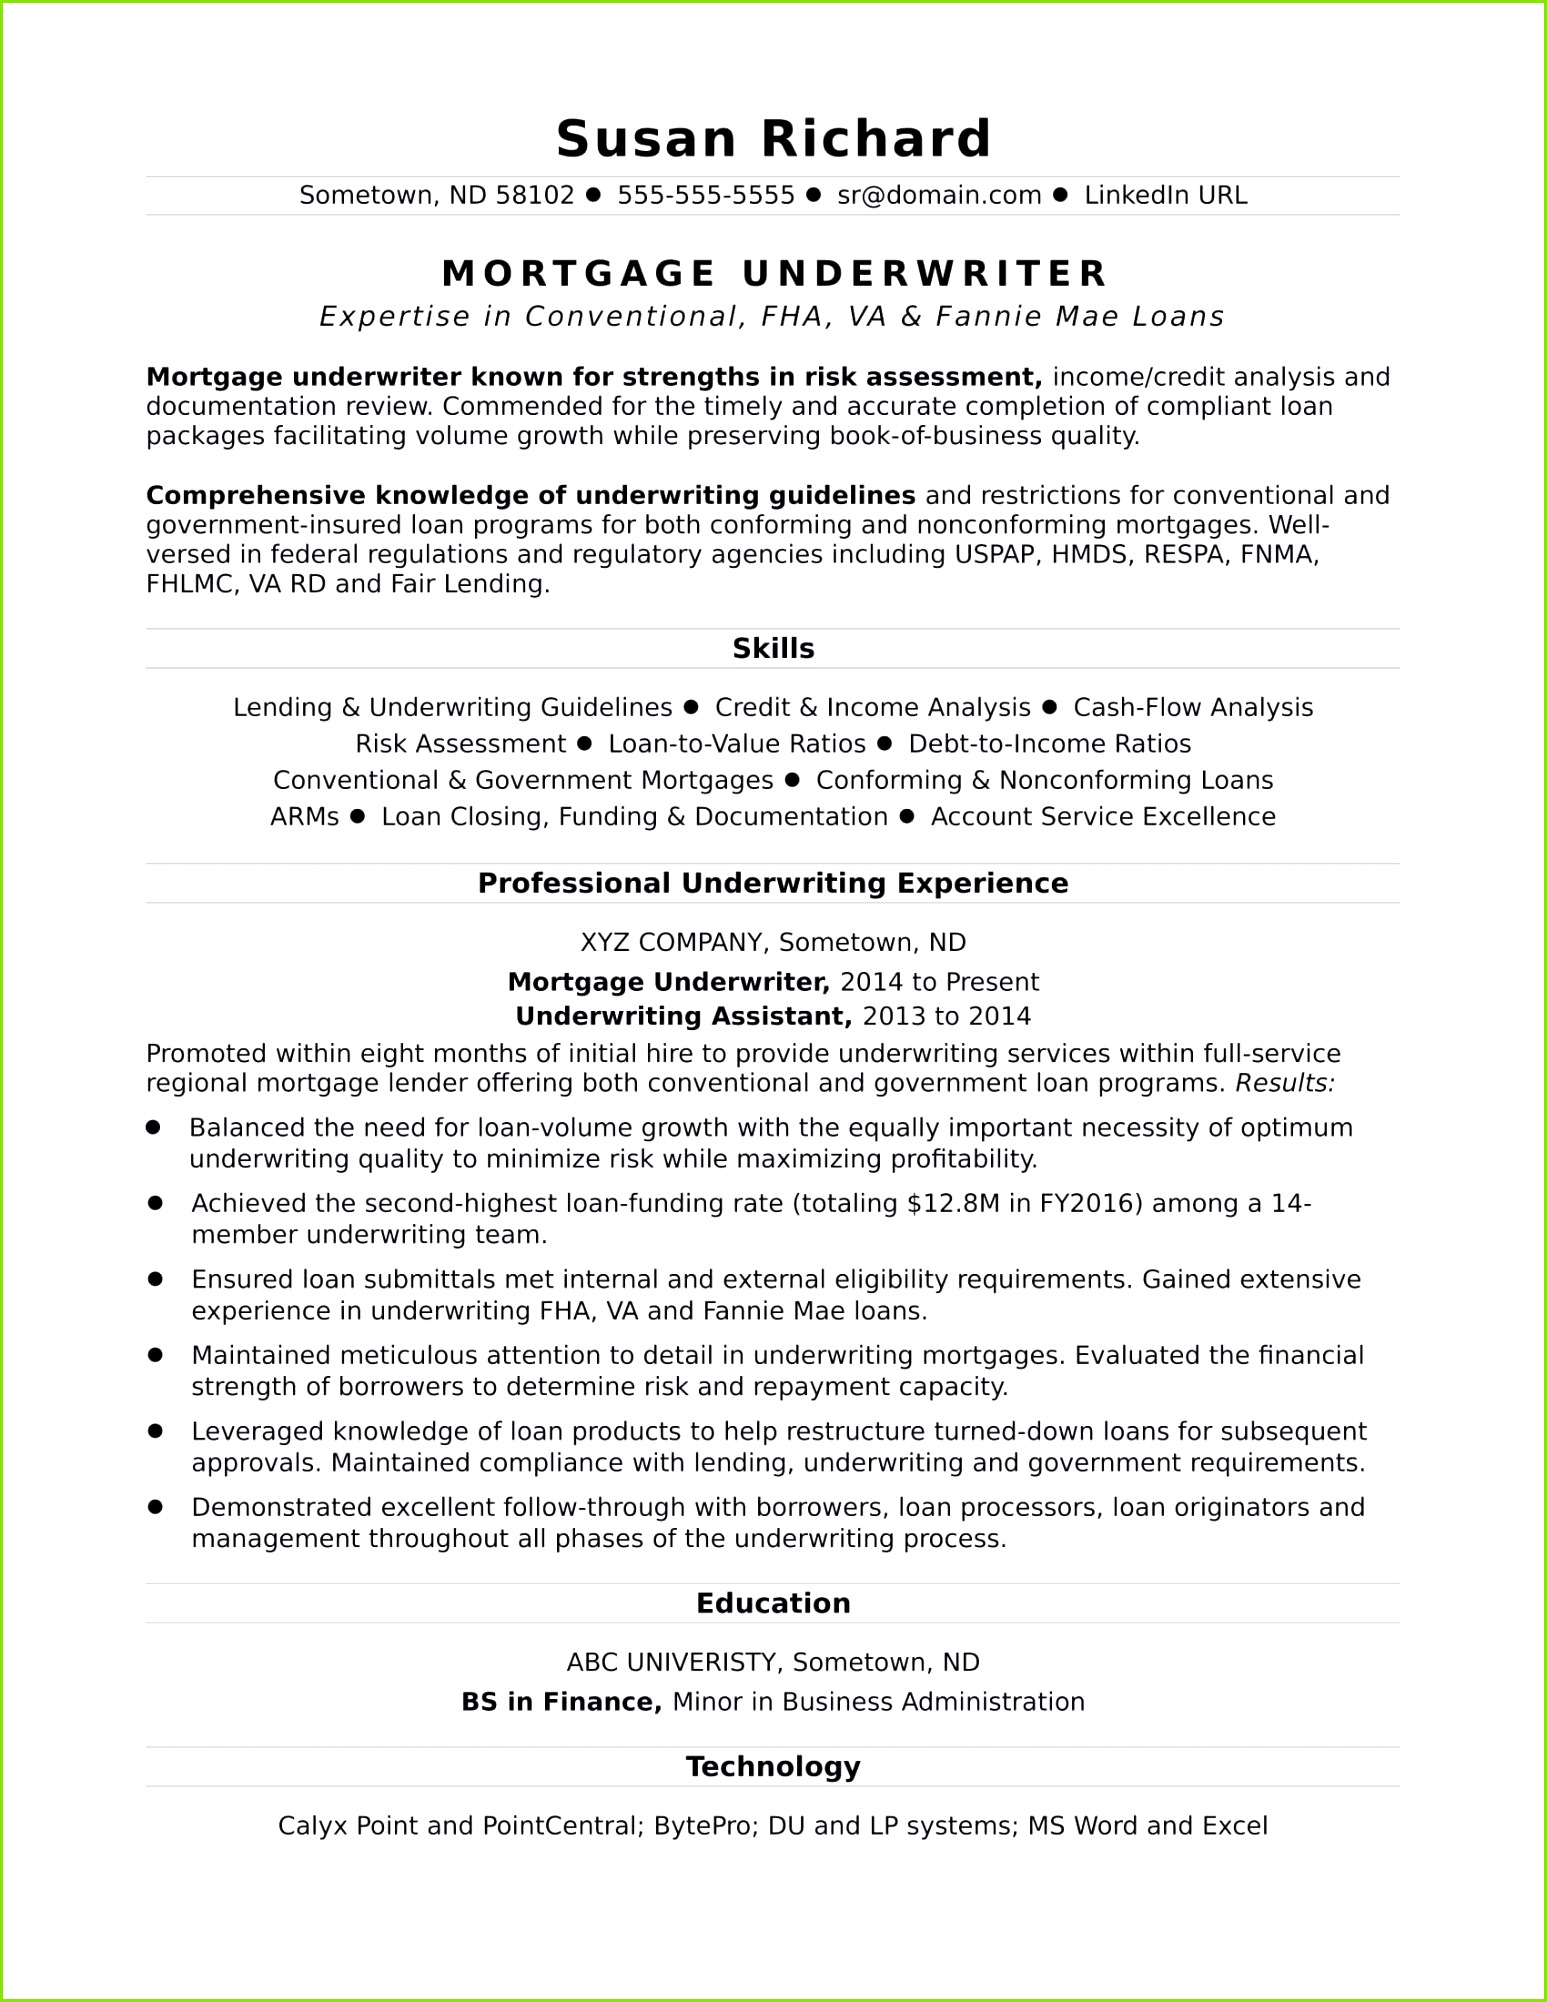 Excel Resume Inspirational Detailed Resume Template Luxury Signs Templates 2018 Rfp Template 0d Einzigartiges Excel Arbeitsblatt